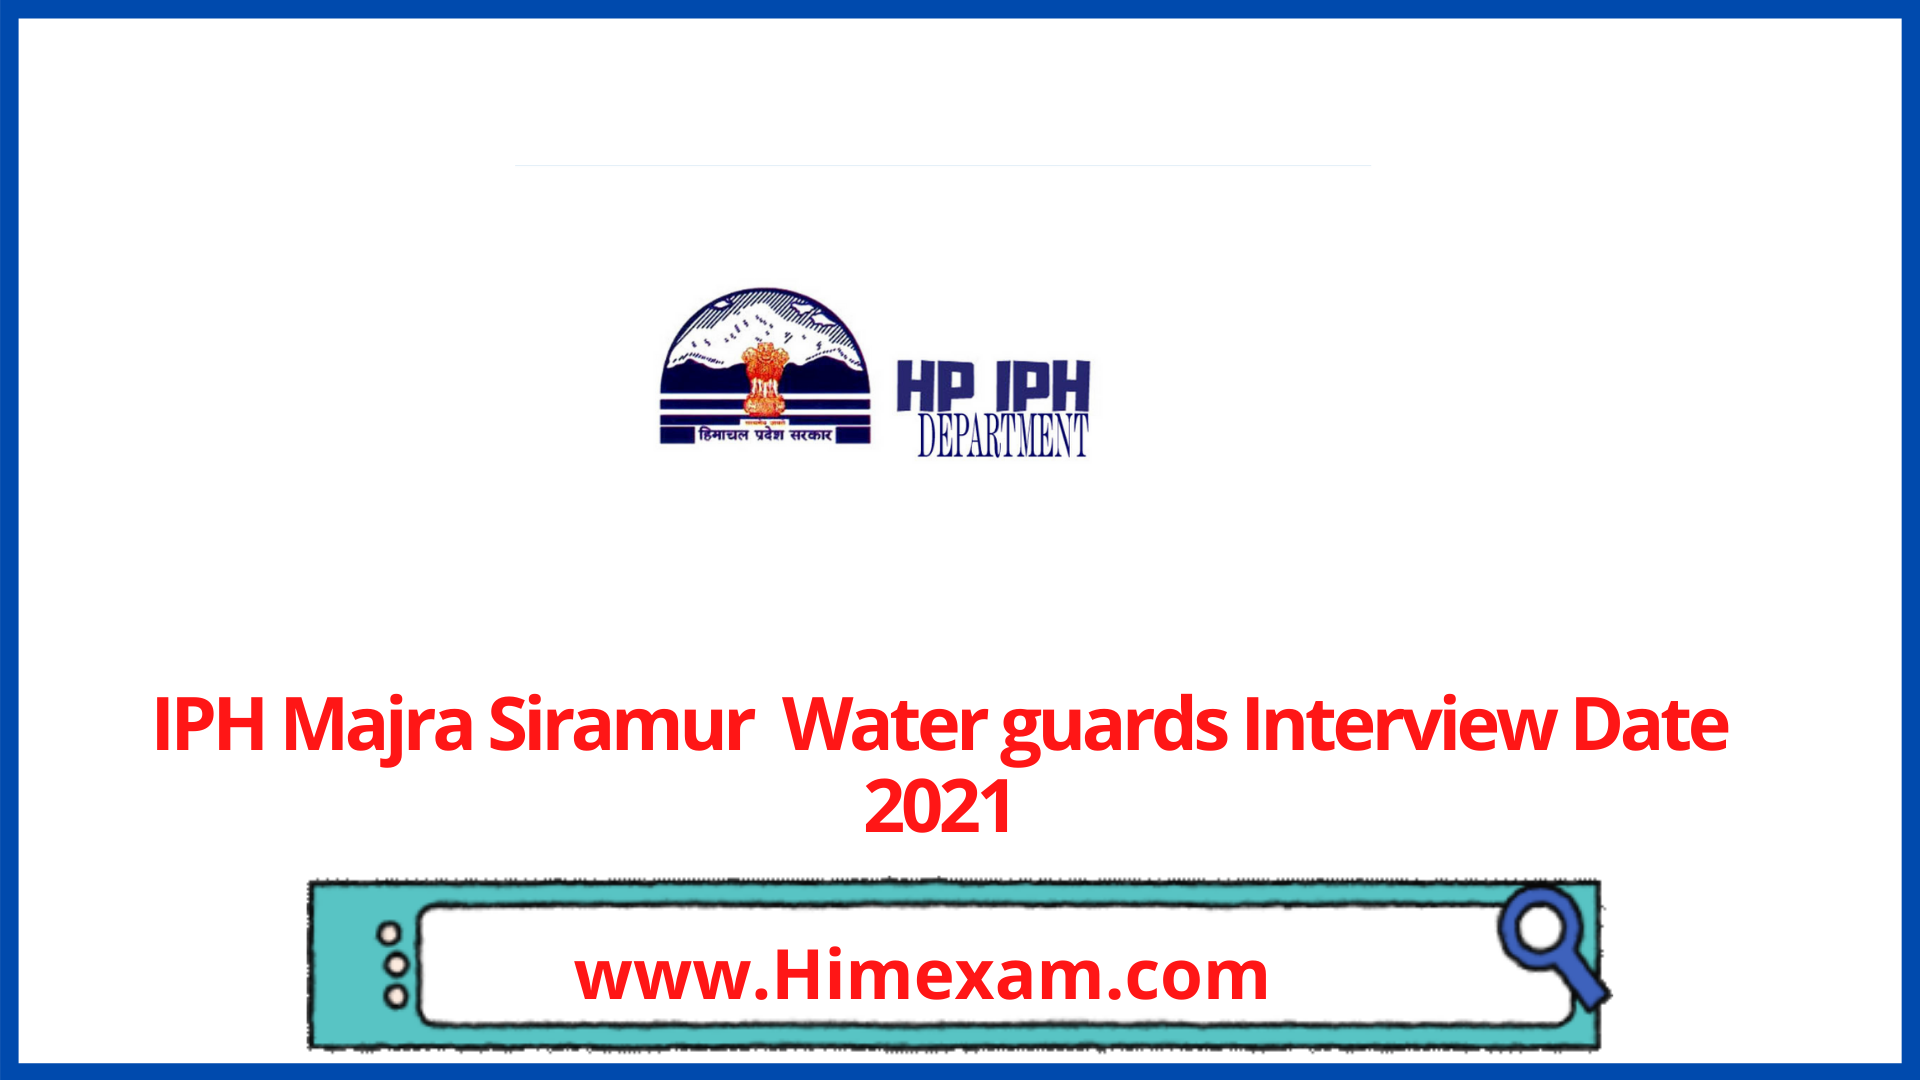 IPH Majra Siramur  Water guards Interview Date 2021